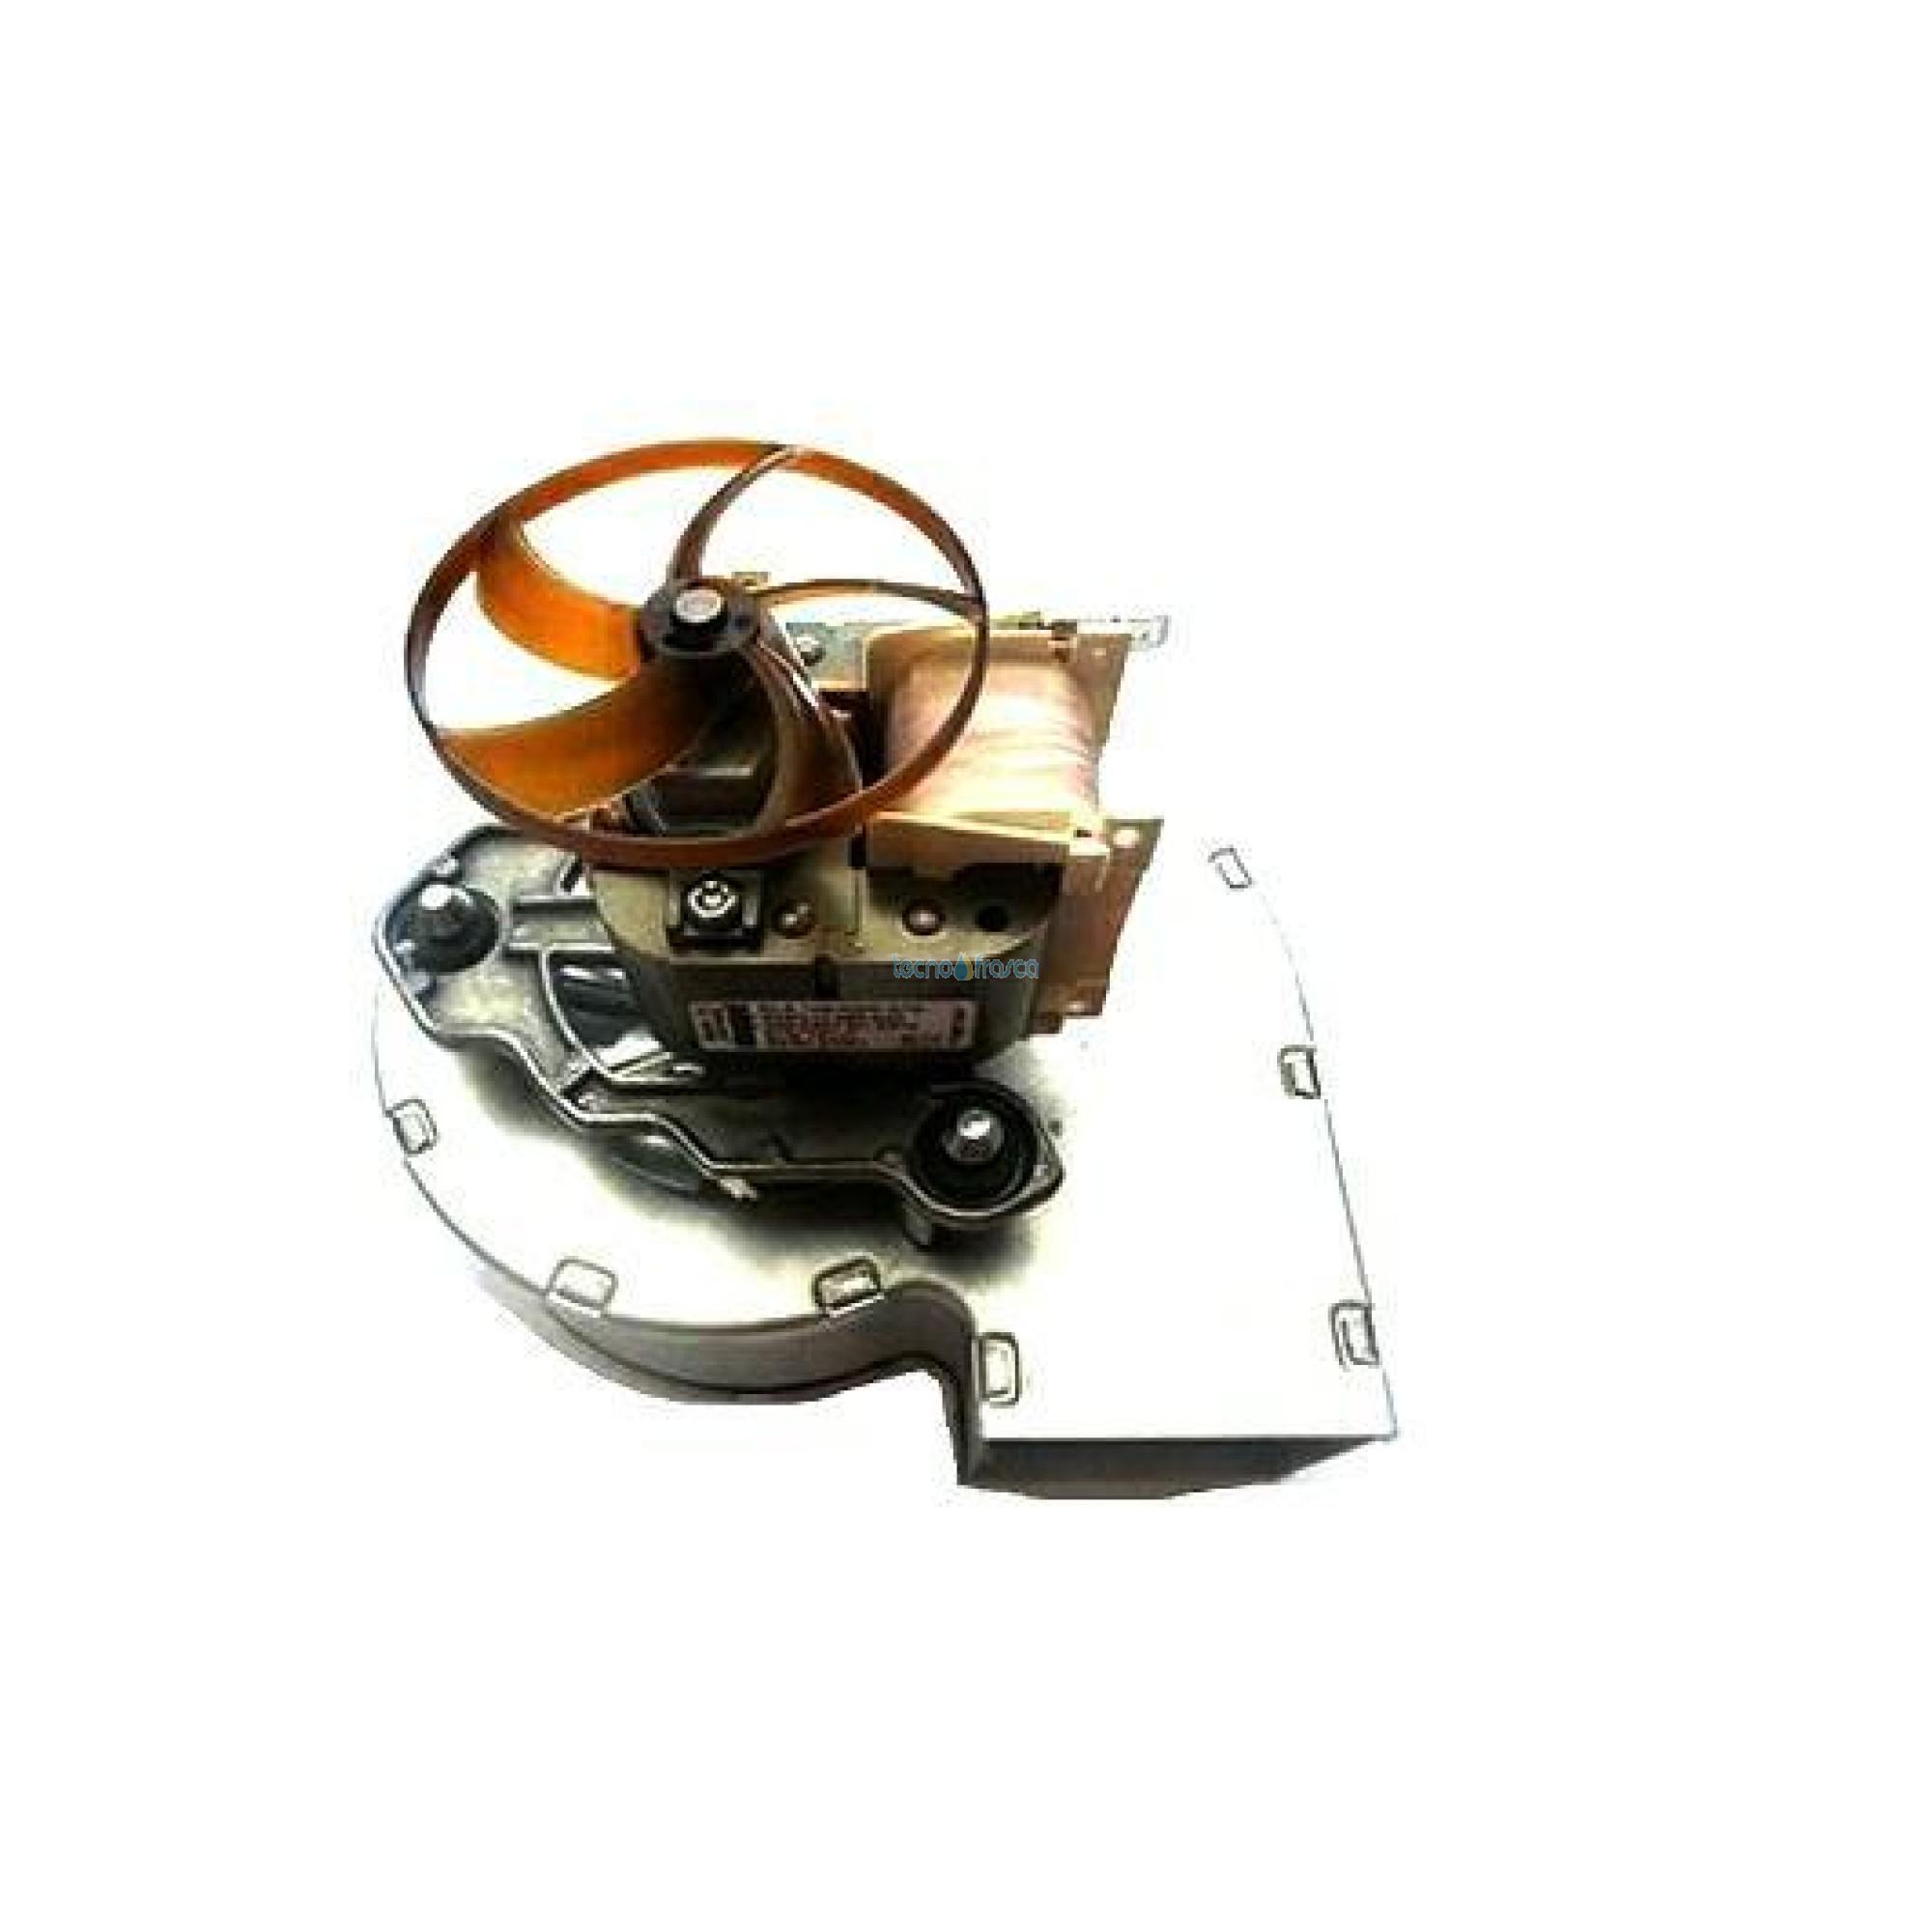 Beretta estrattore rl108/340 r2865